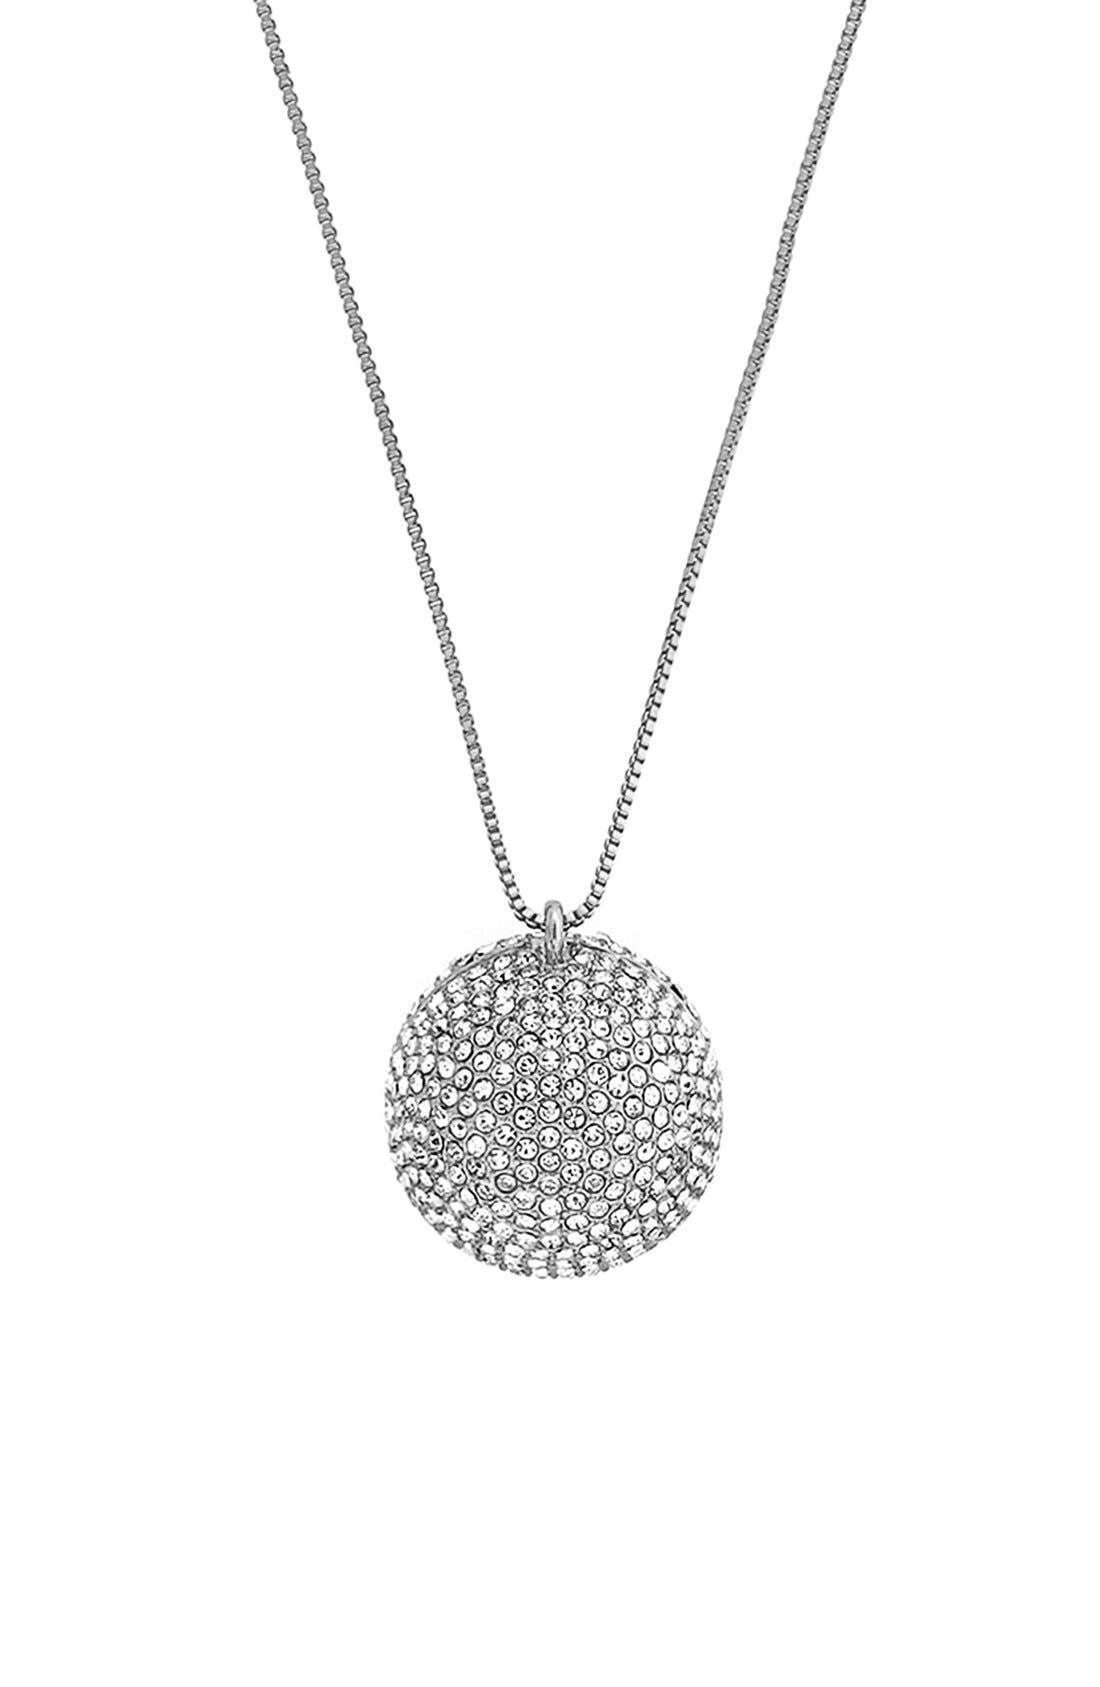 Main Image - Vince Camuto Pavé Ball Locket Long Pendant Necklace